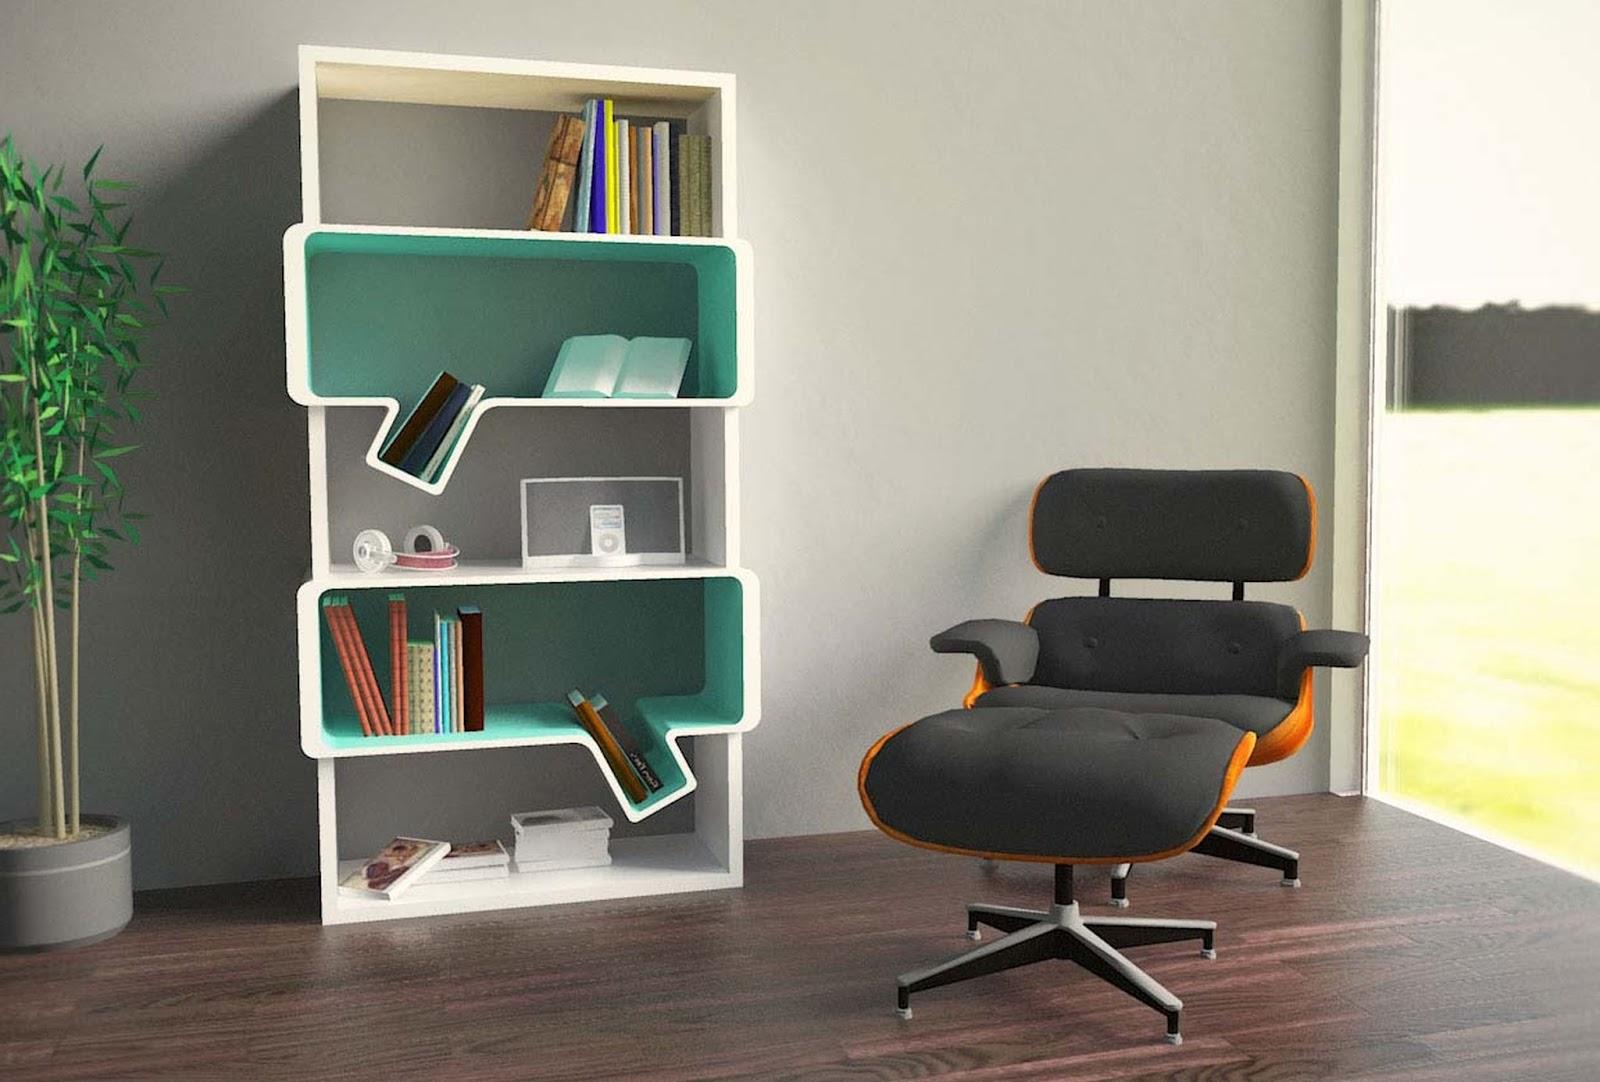 Groovy Modern Bookshelf Ideas 12 Best Bookshelf Ideas Kate Home Designs Largest Home Design Picture Inspirations Pitcheantrous